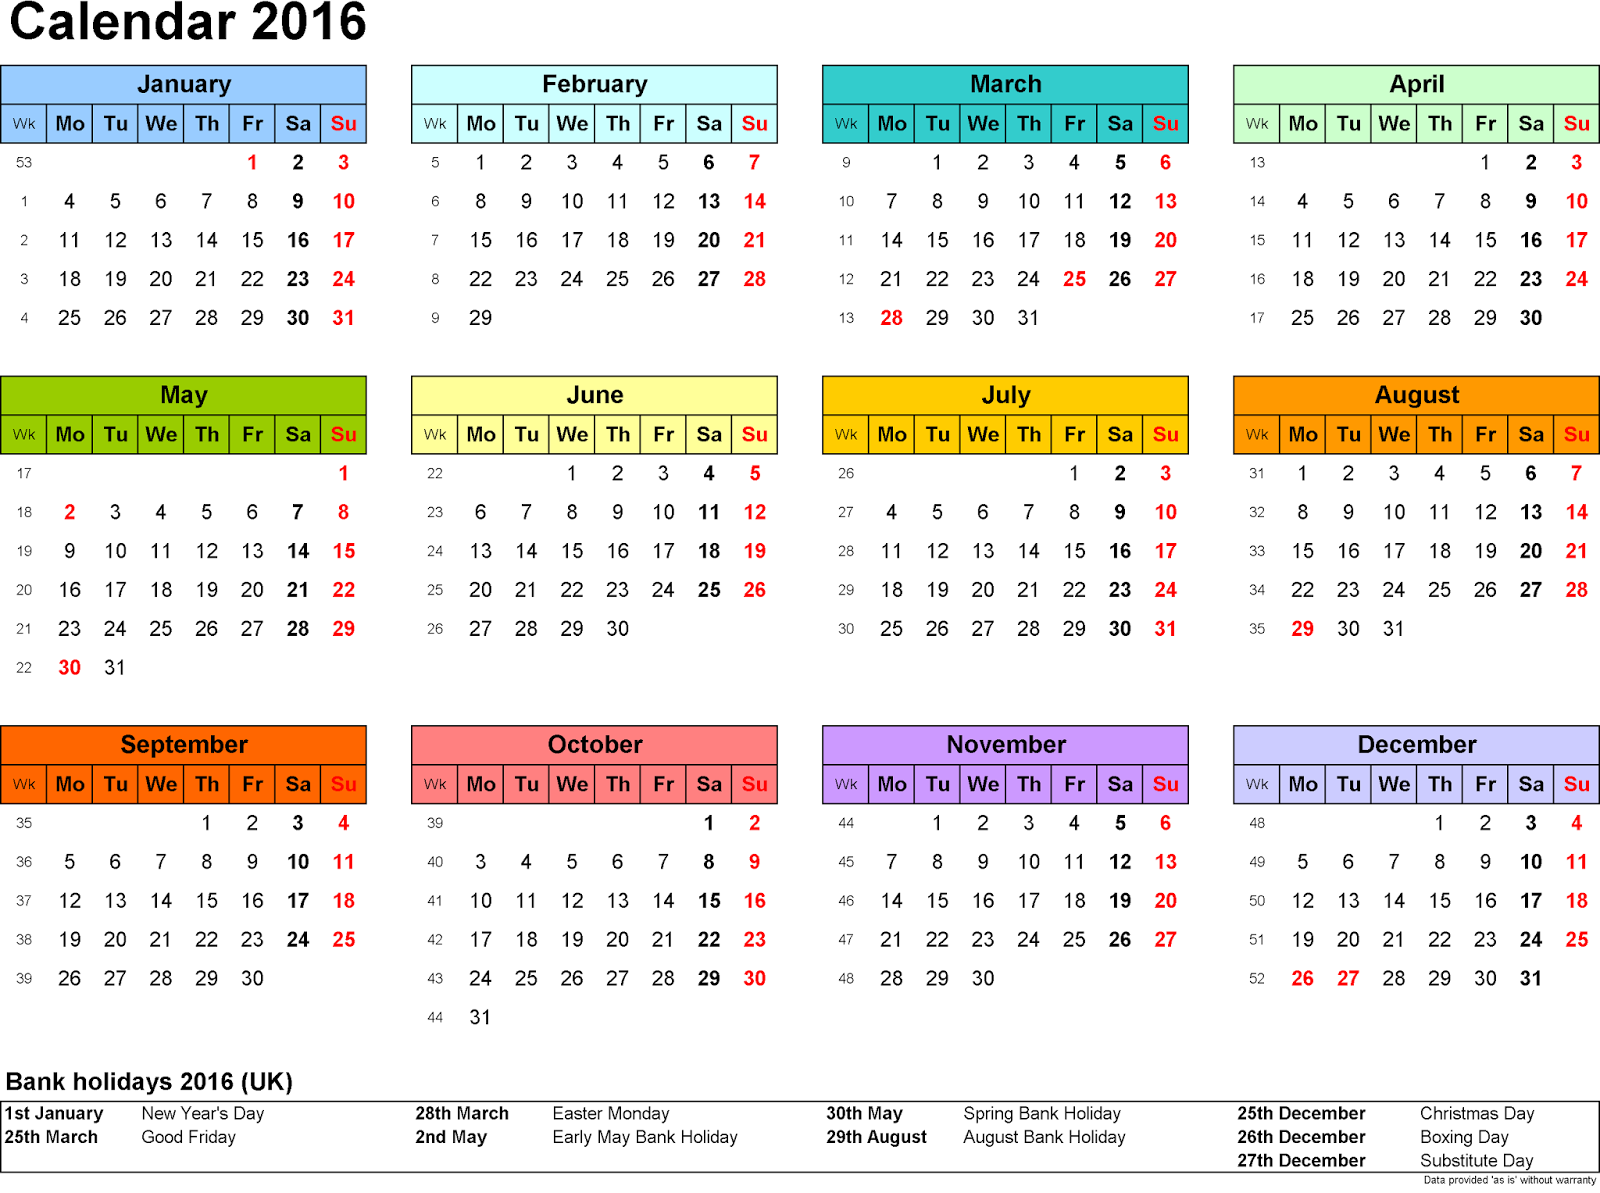 Calendar Holidays : Calendar with federal bank holidays